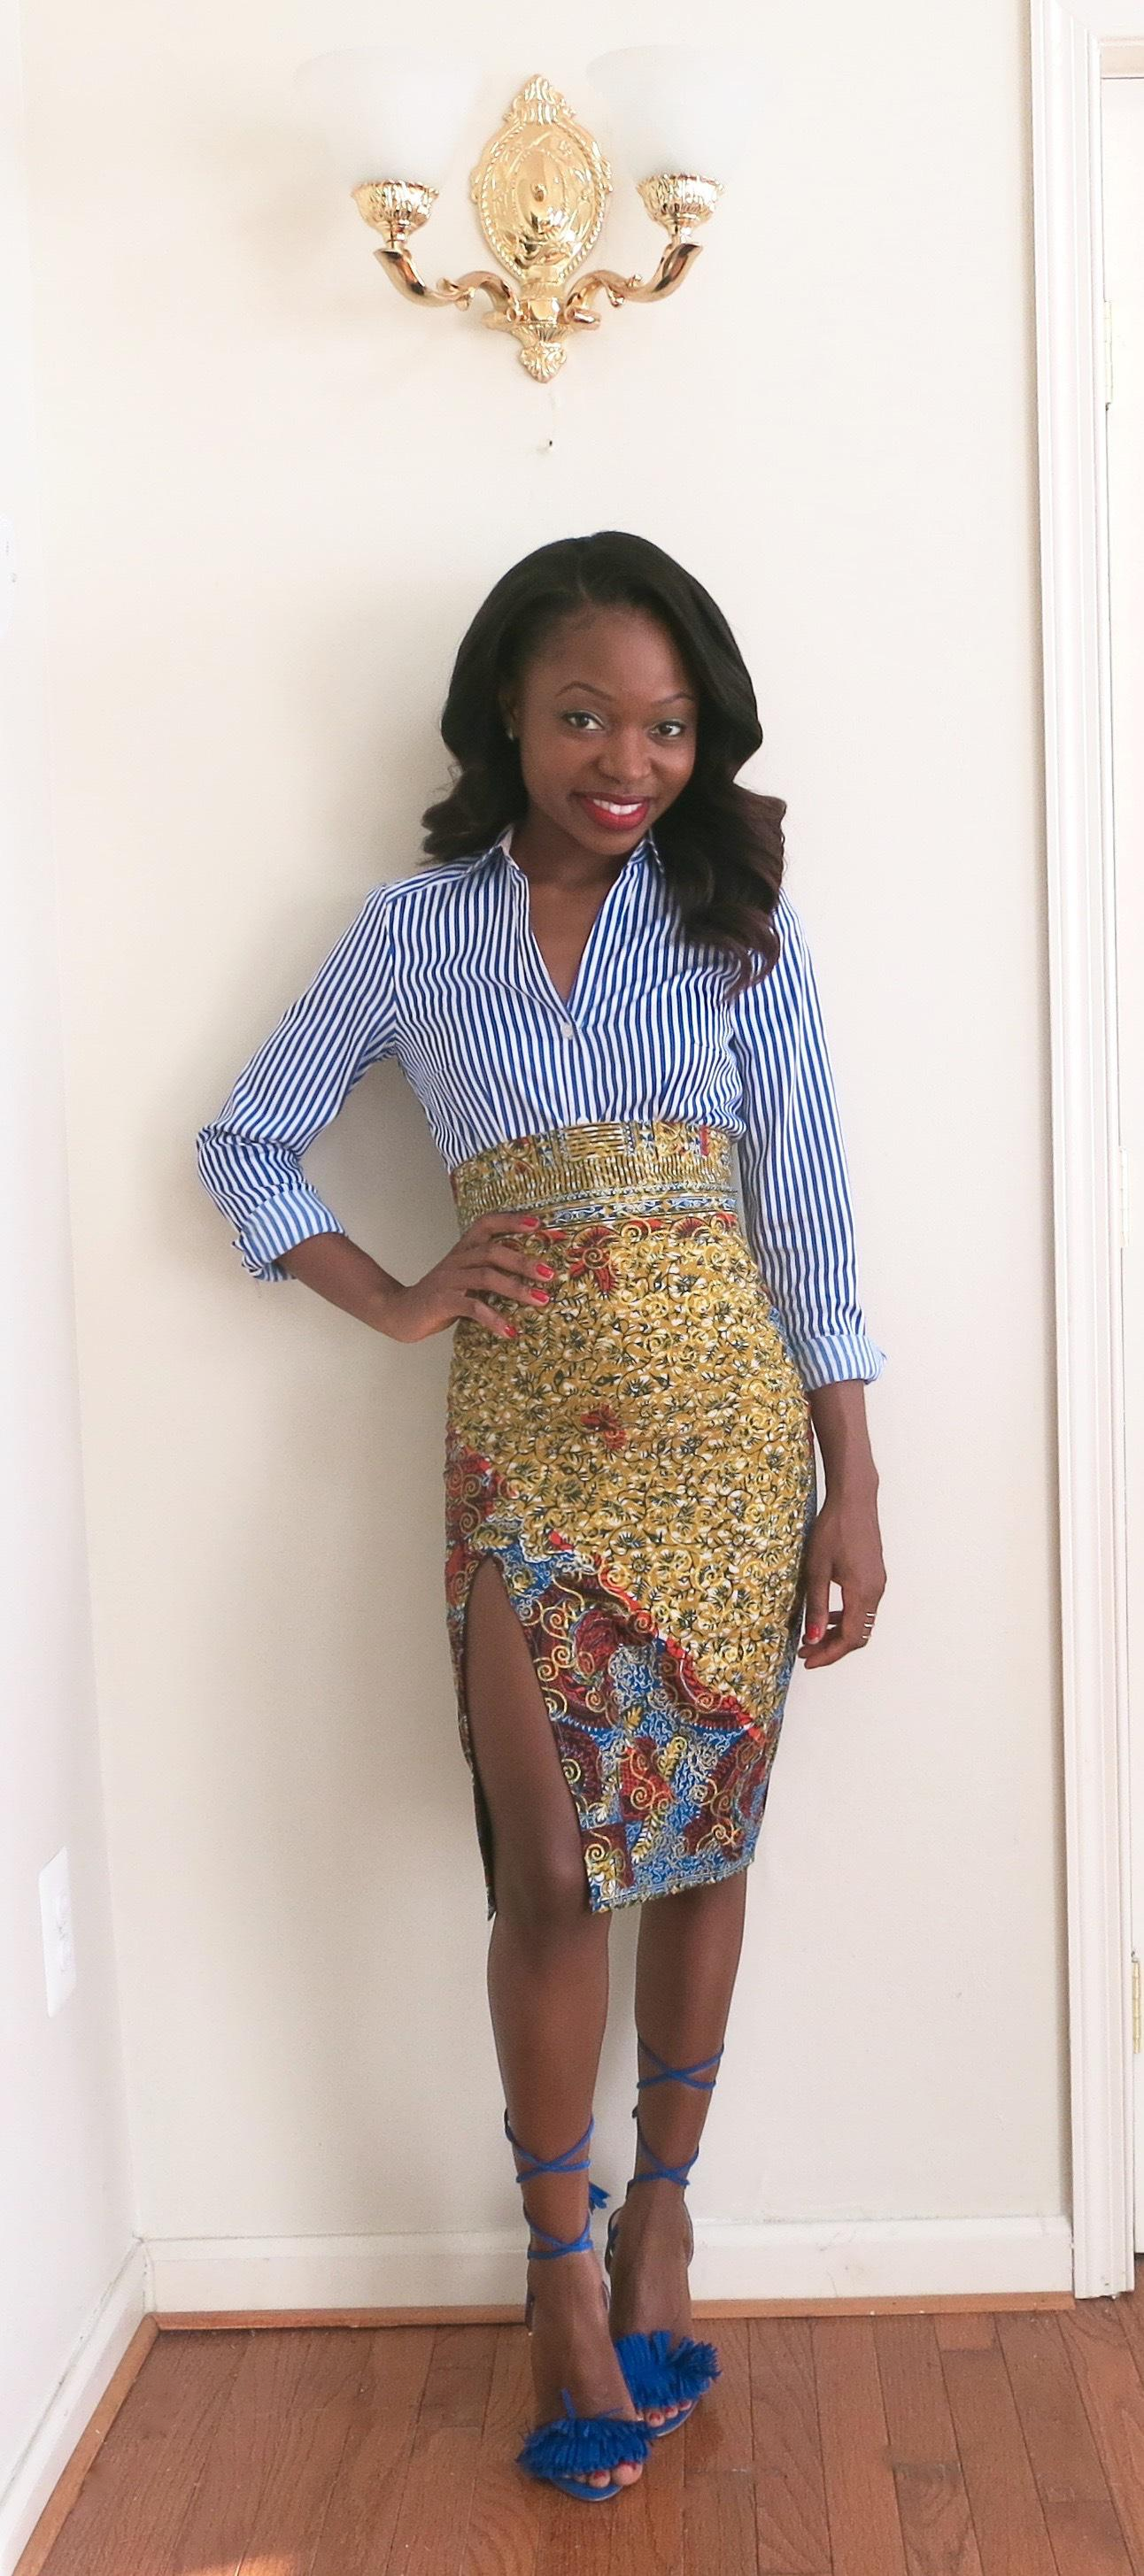 Fashion Bombshell Of The Day Janet From Maryland Fashion Bomb Daily Style Magazine Celebrity